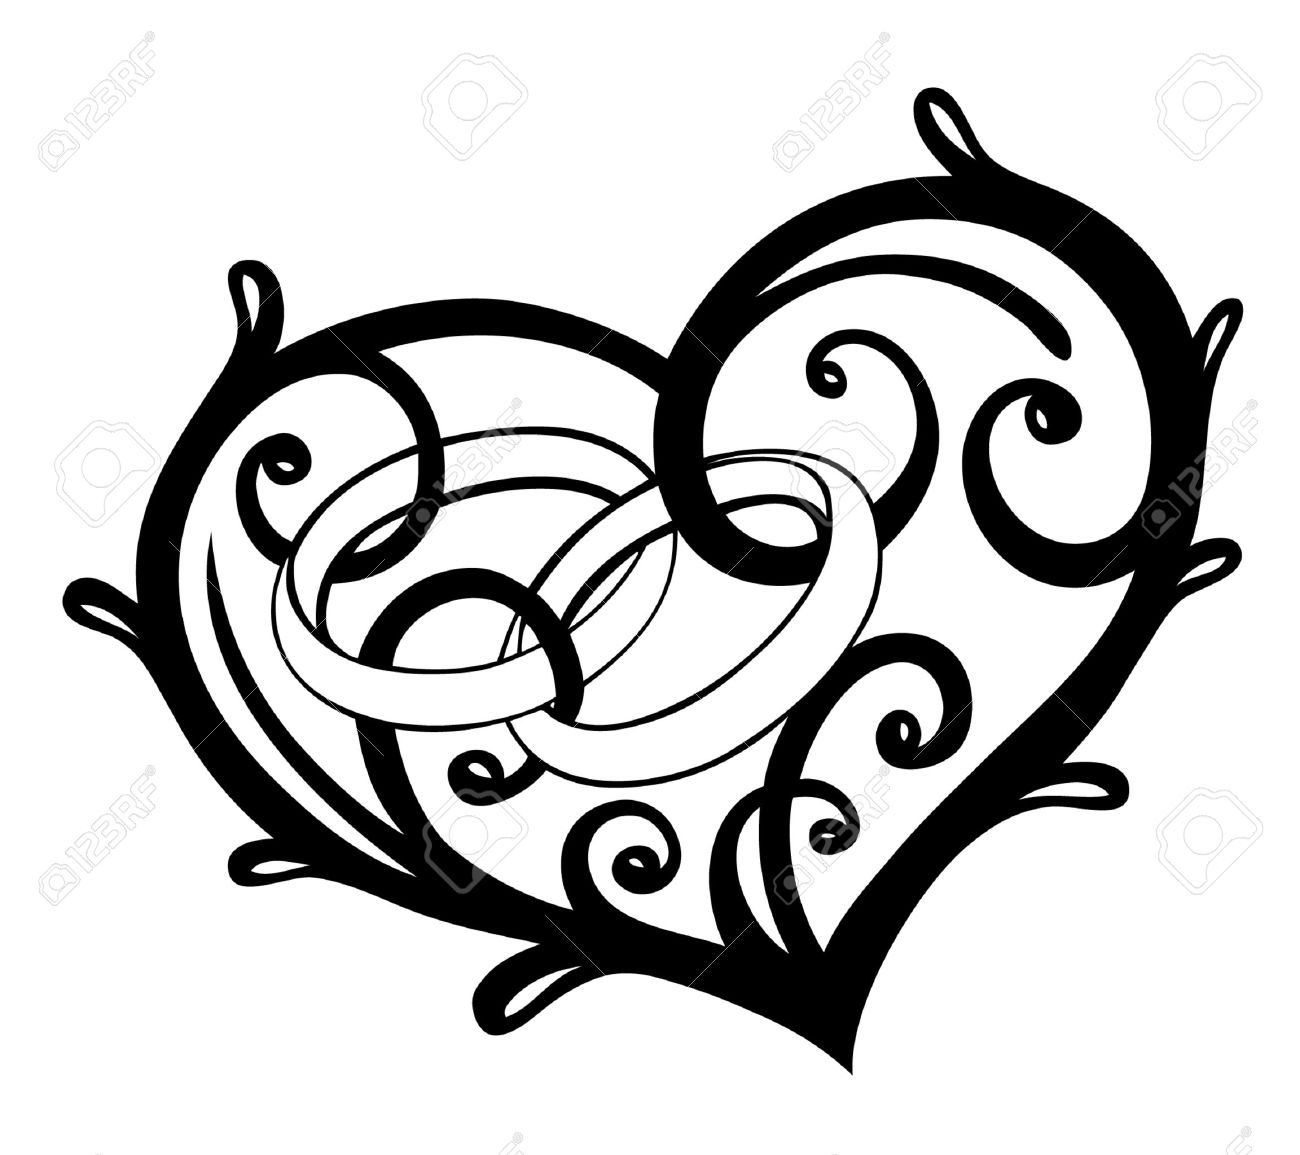 Heart with wedding rings, vector design elements Standard-Bild - 22437397